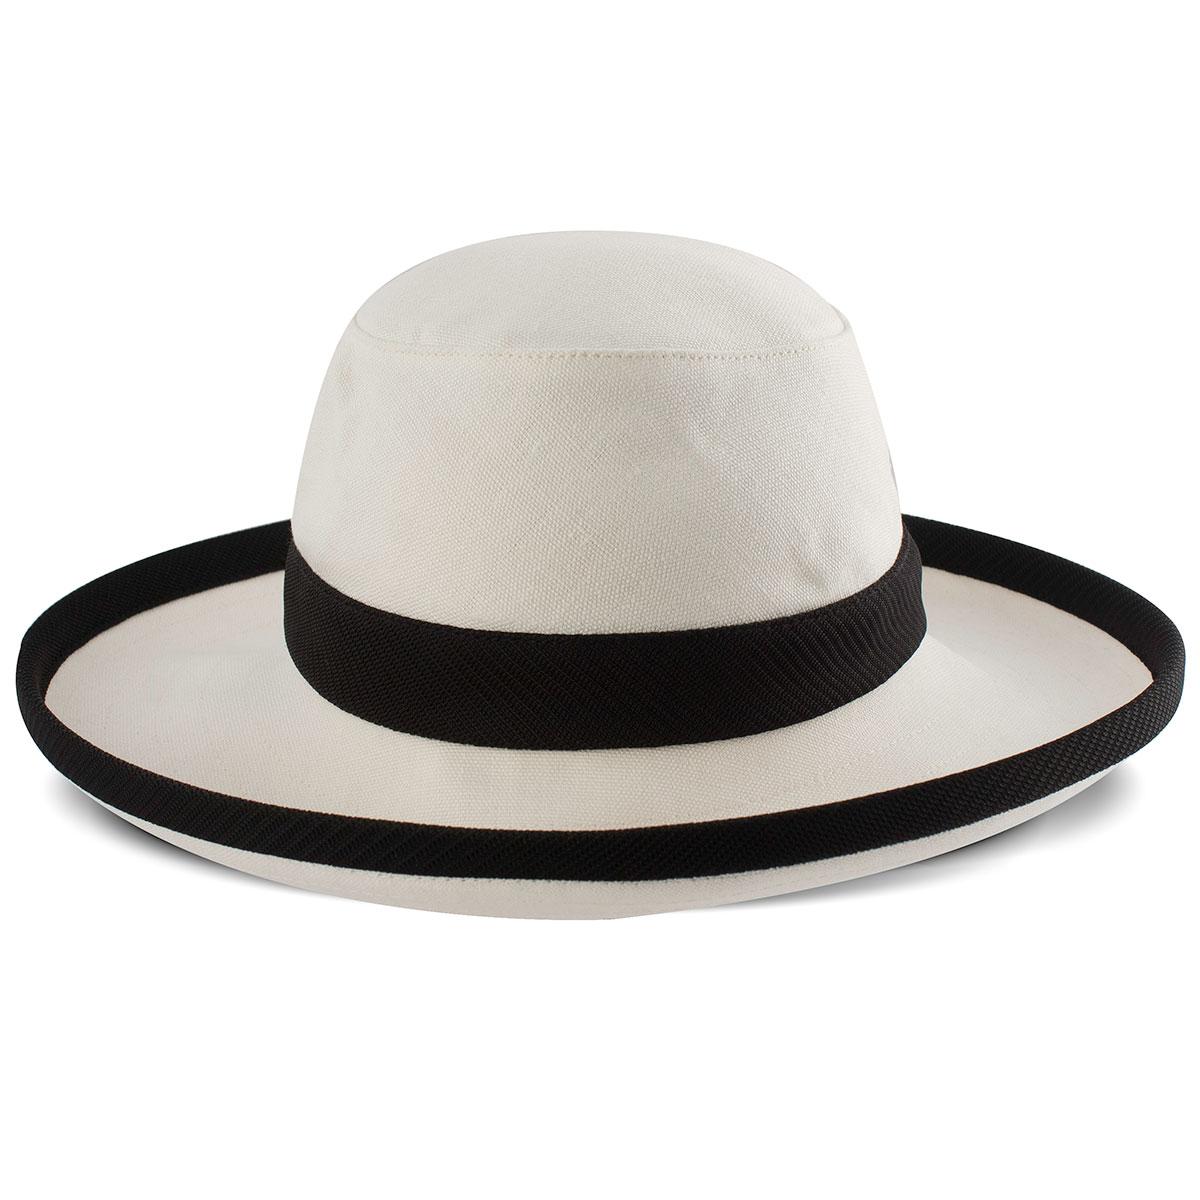 1960s – 70s Style Men's Hats Charlotte Hemp Bretton $85.00 AT vintagedancer.com